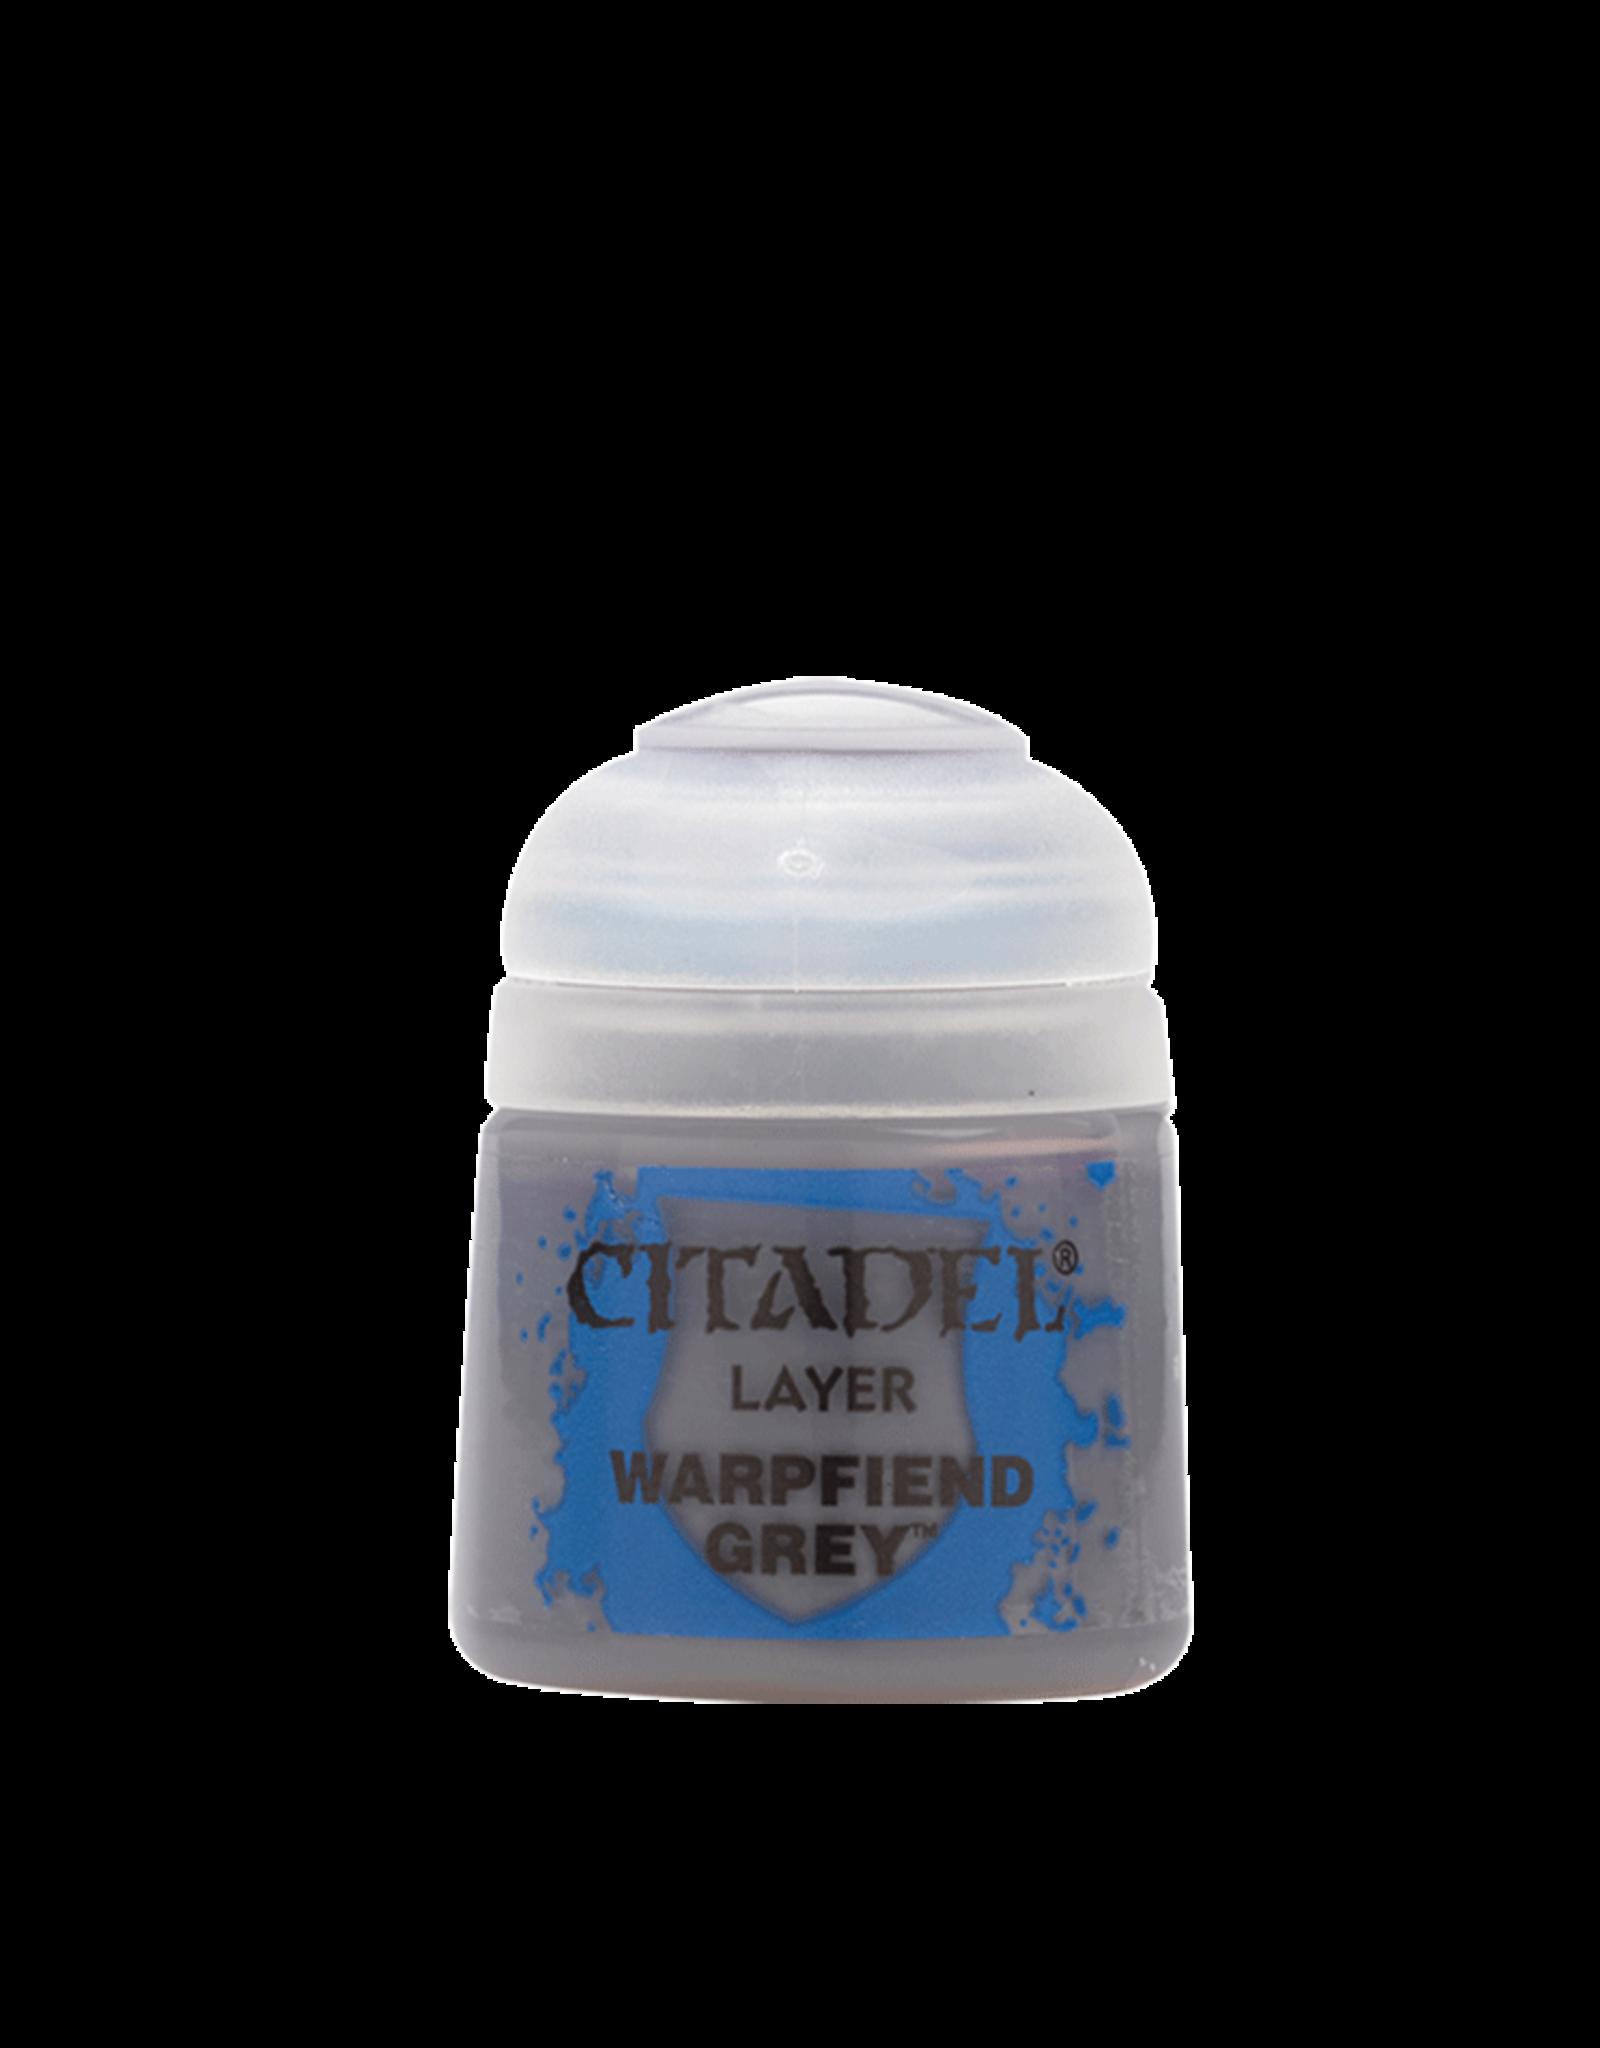 Citadel Citadel Layer: Warpfiend Grey (12ml)